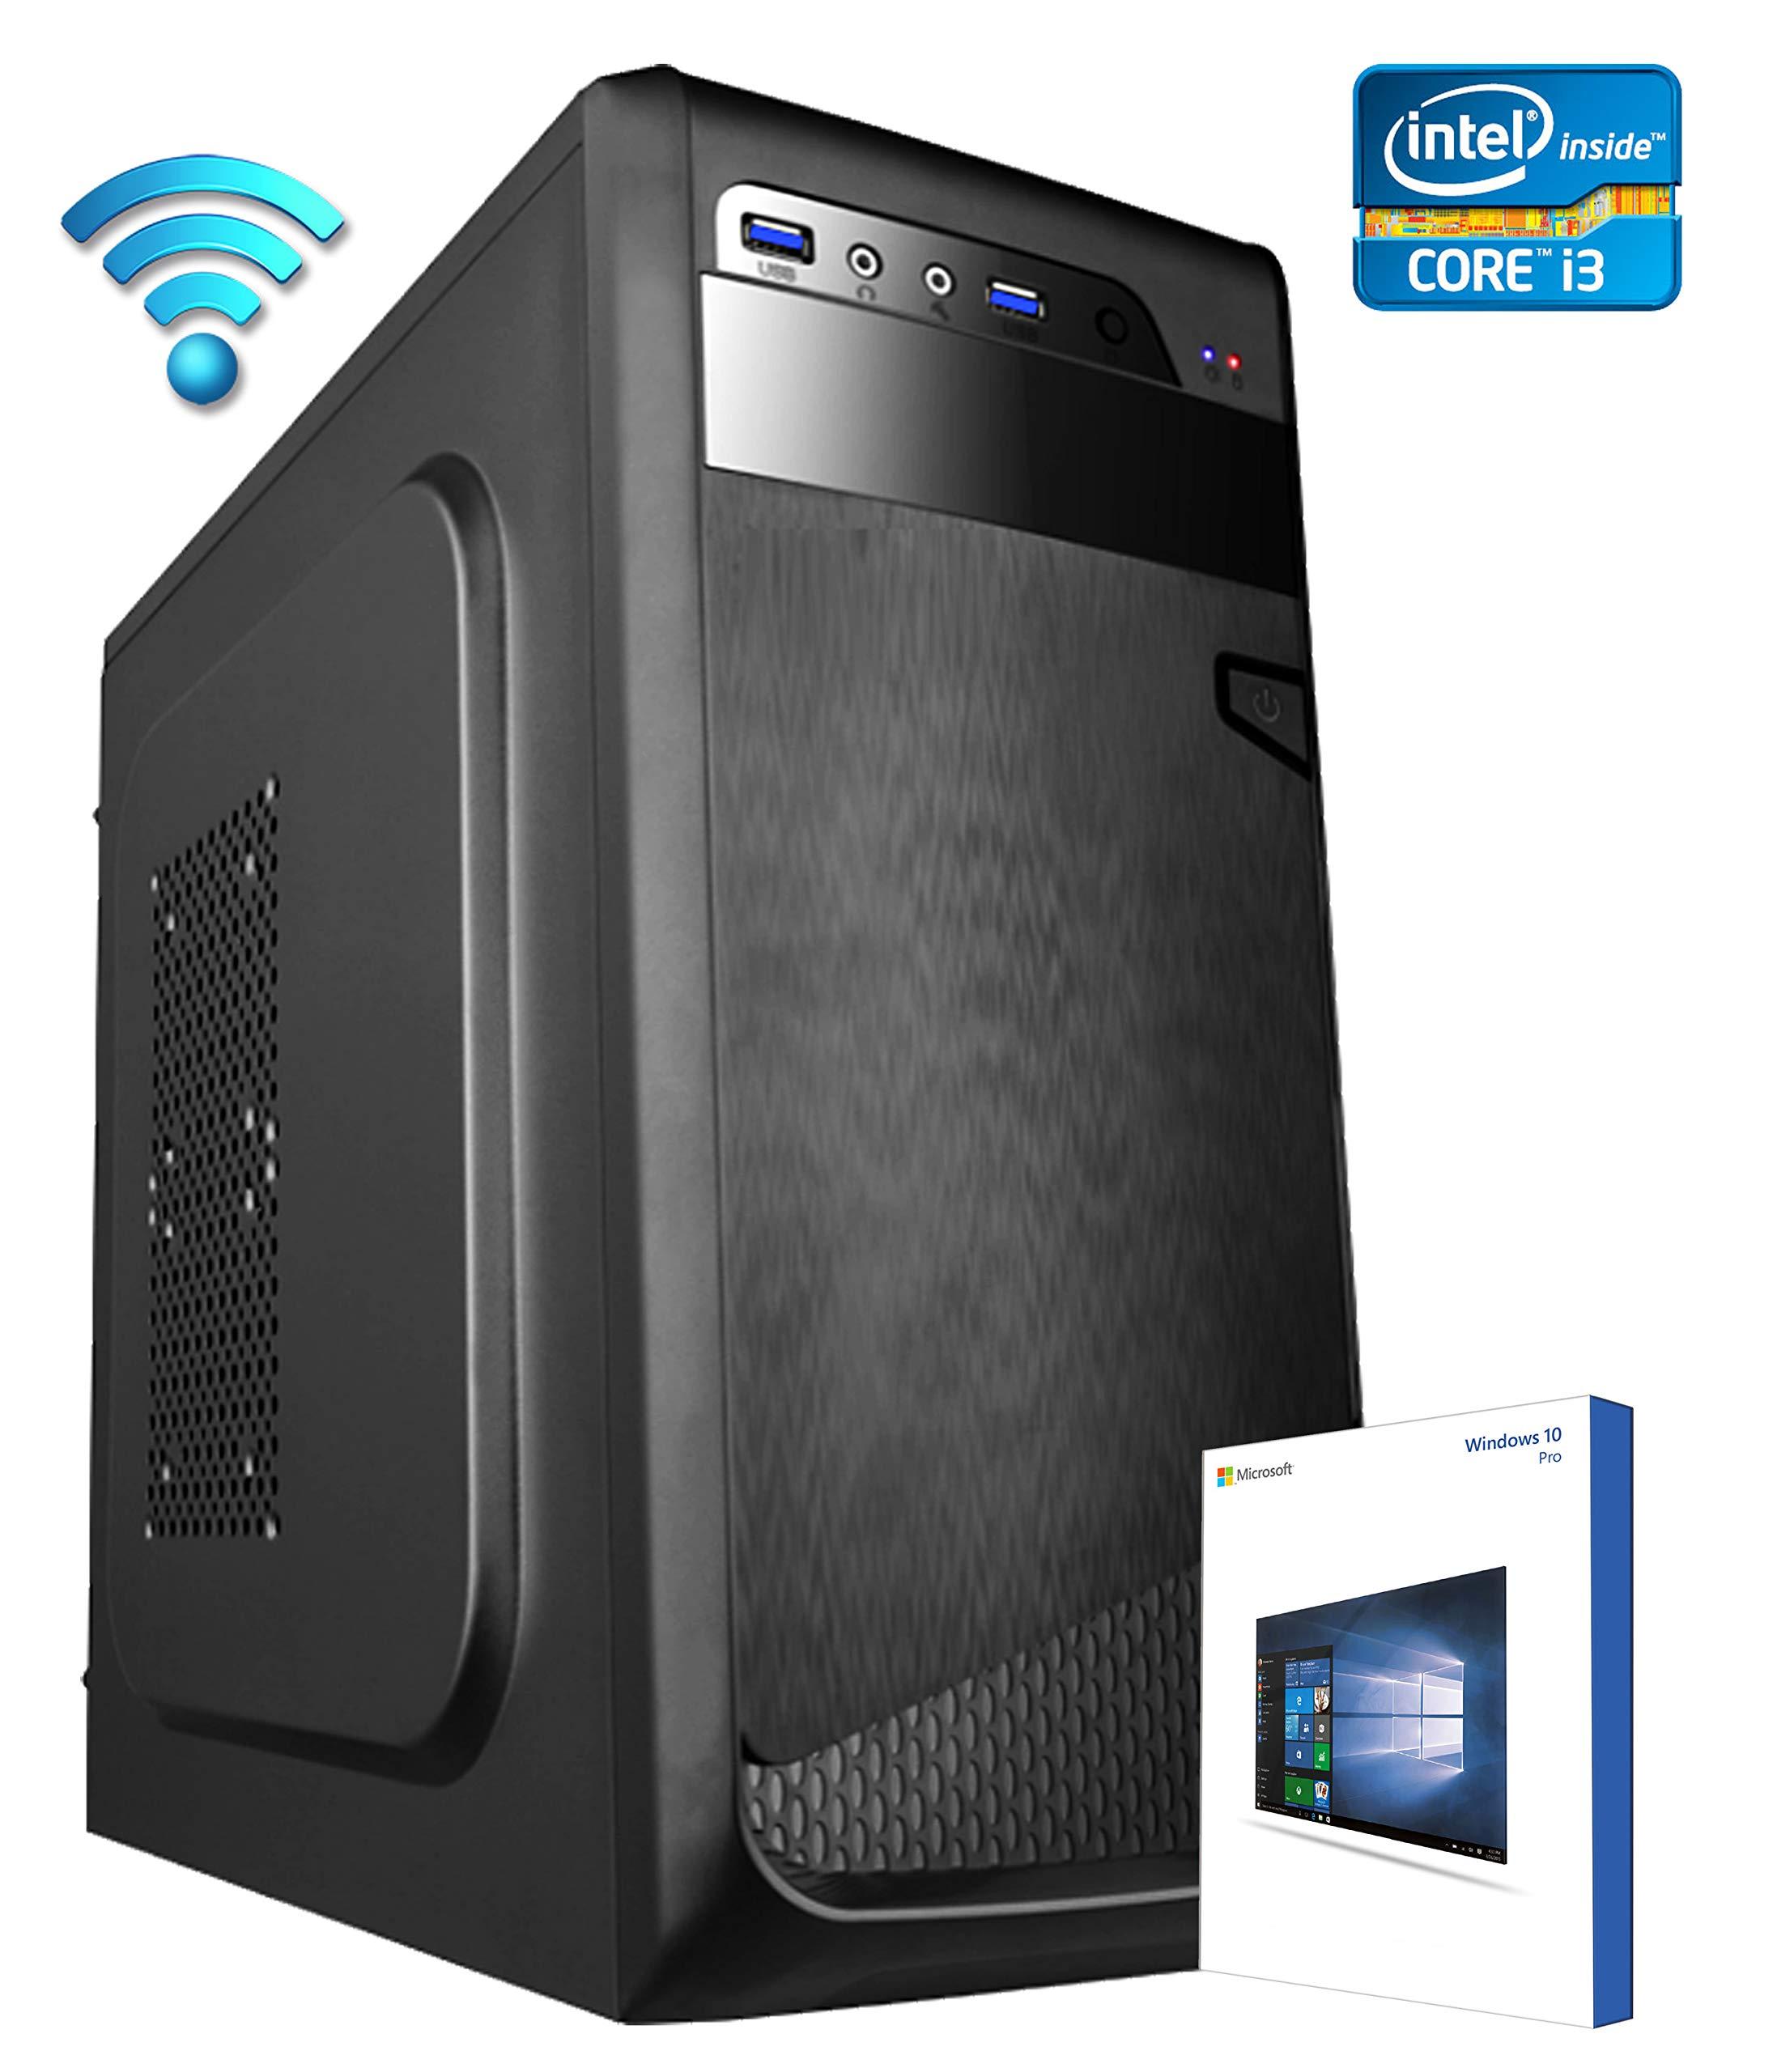 2a51fe89edccb3 PC DESKTOP COMPUTER FISSO▭LICENZA WINDOWS 10 PRO▭ASSEMBLATO COMPLETO Intel  KABY LAKE i3-8100 3.60 GHZ▭Intel® HD 630 4K▭RAM 8GB▭SSD + HD ...